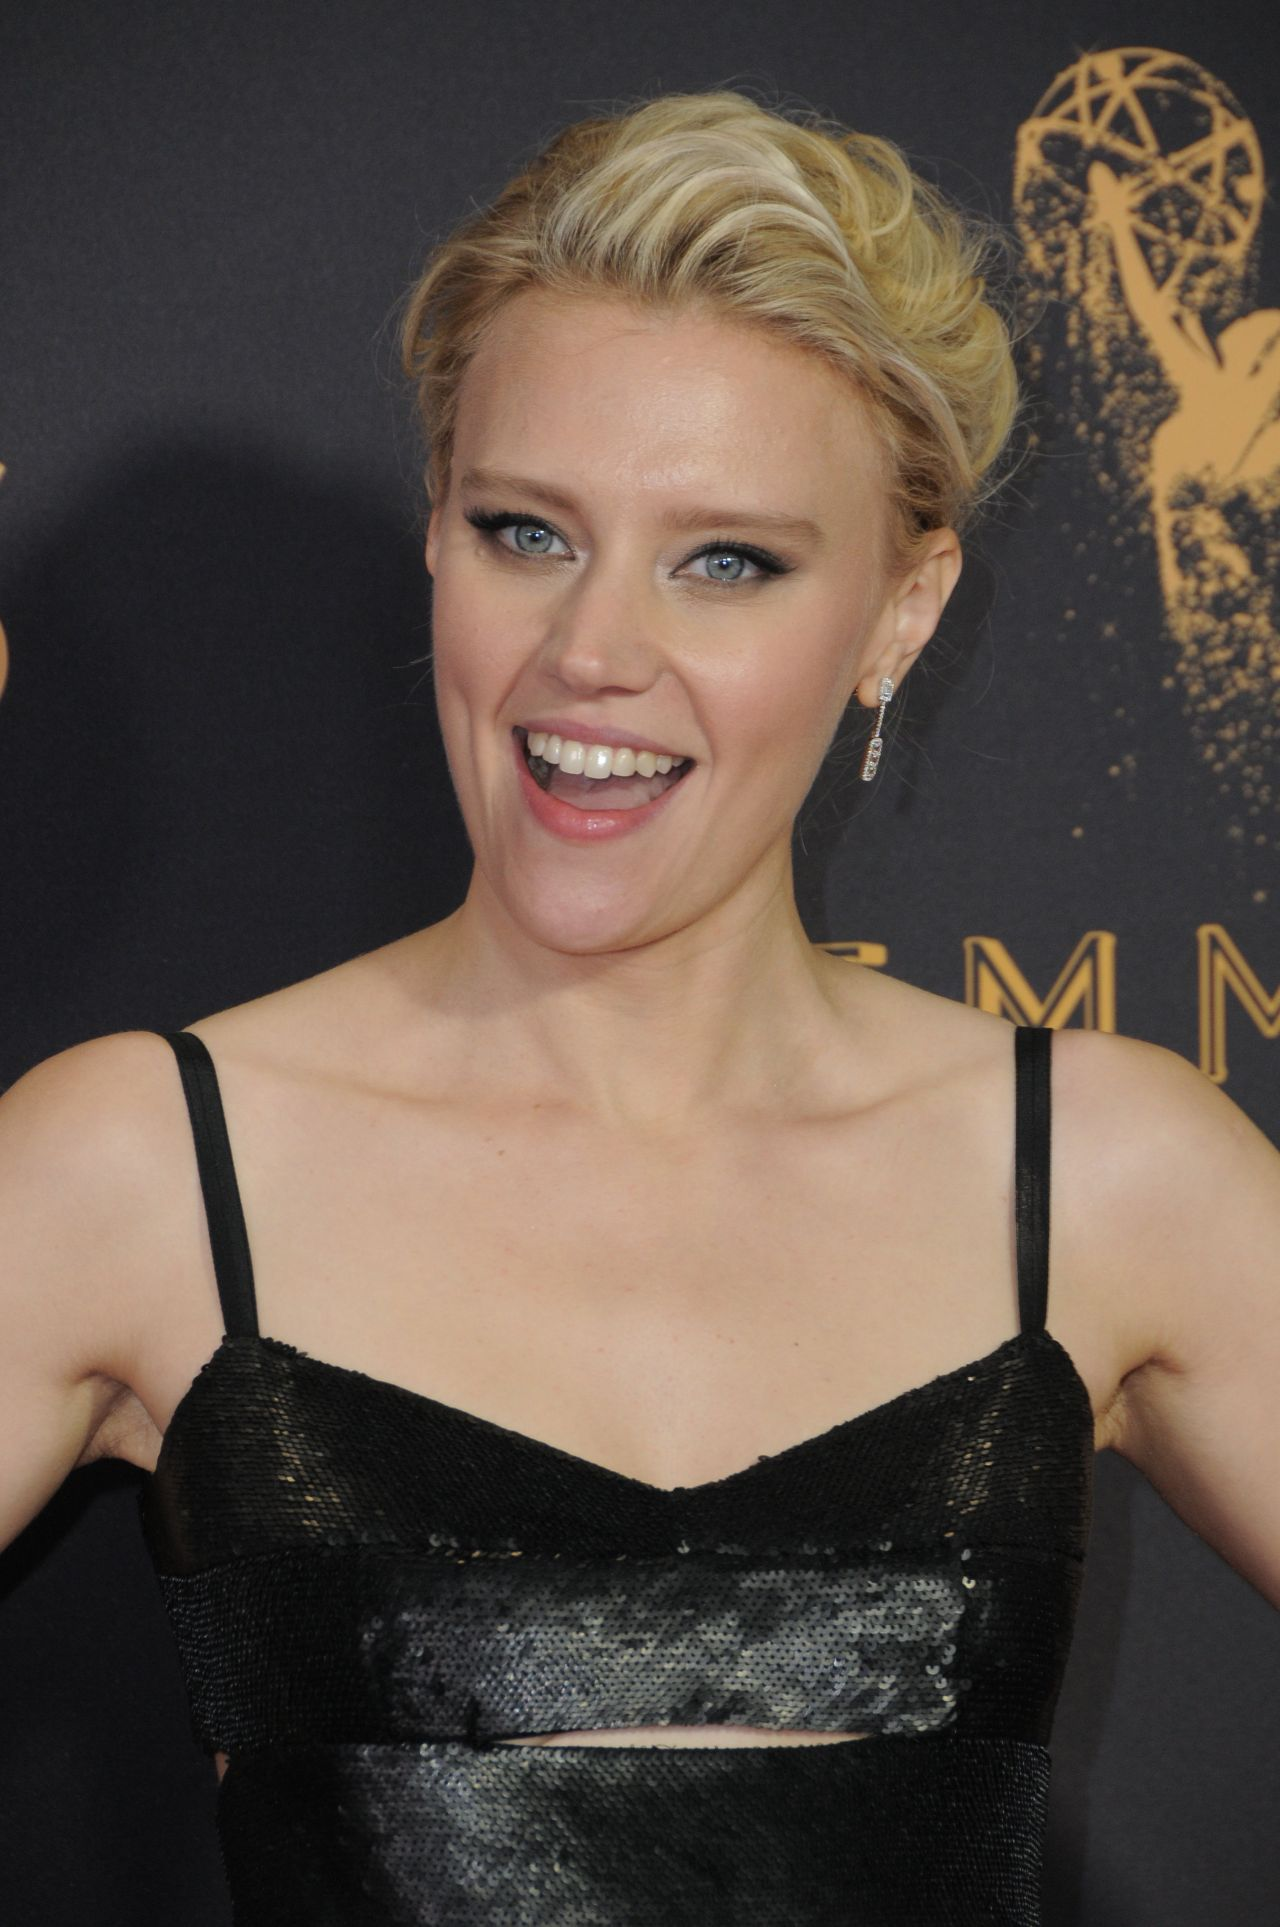 Kate Mckinnon Emmy Awards In Los Angeles 09 17 2017